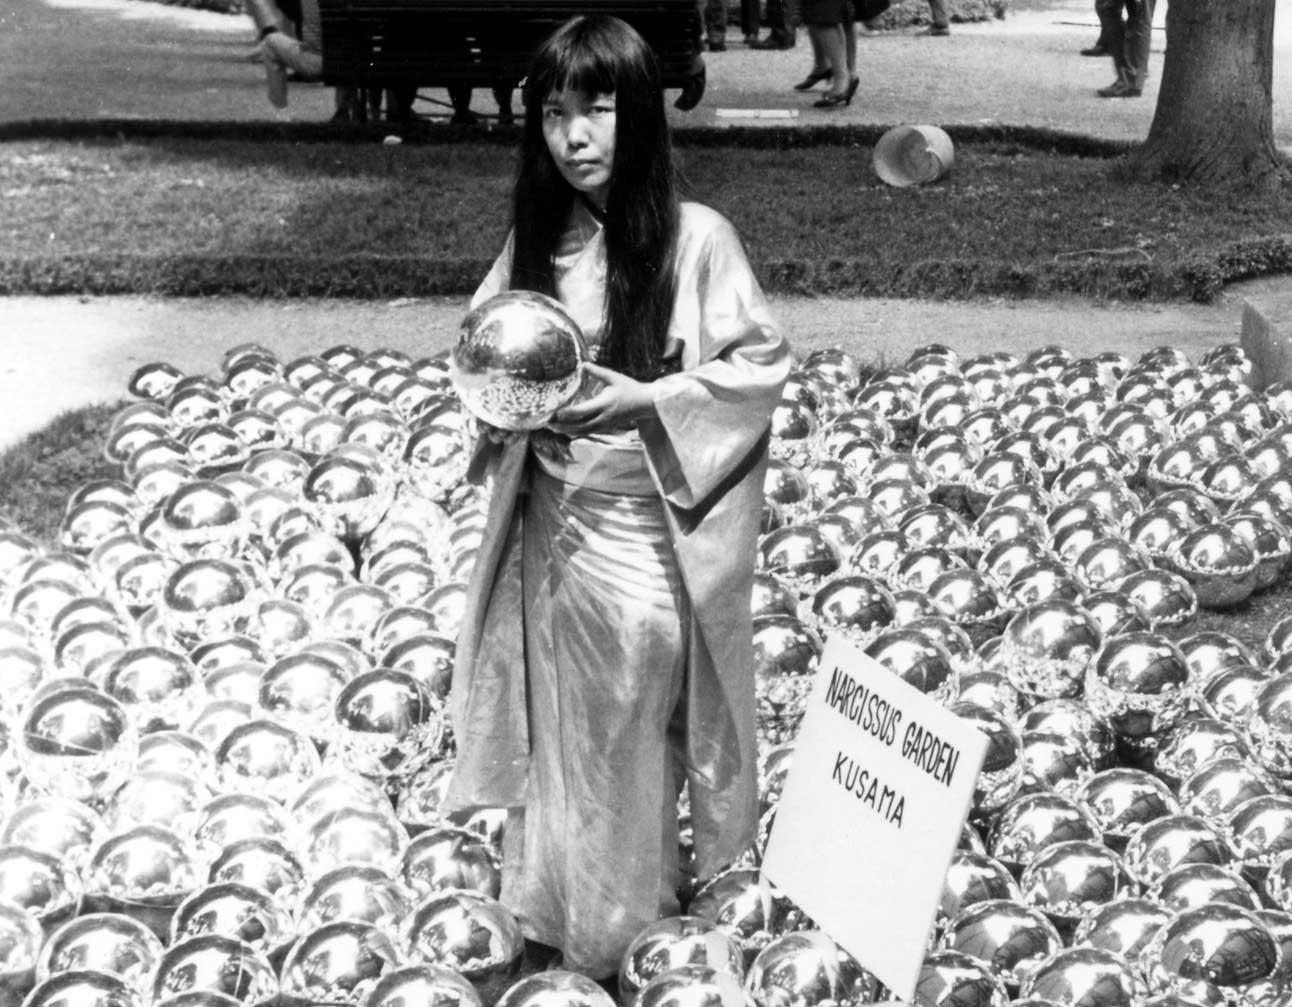 Yayoi Kusama's Narcissus Garden at the Venice Biennale, 1966